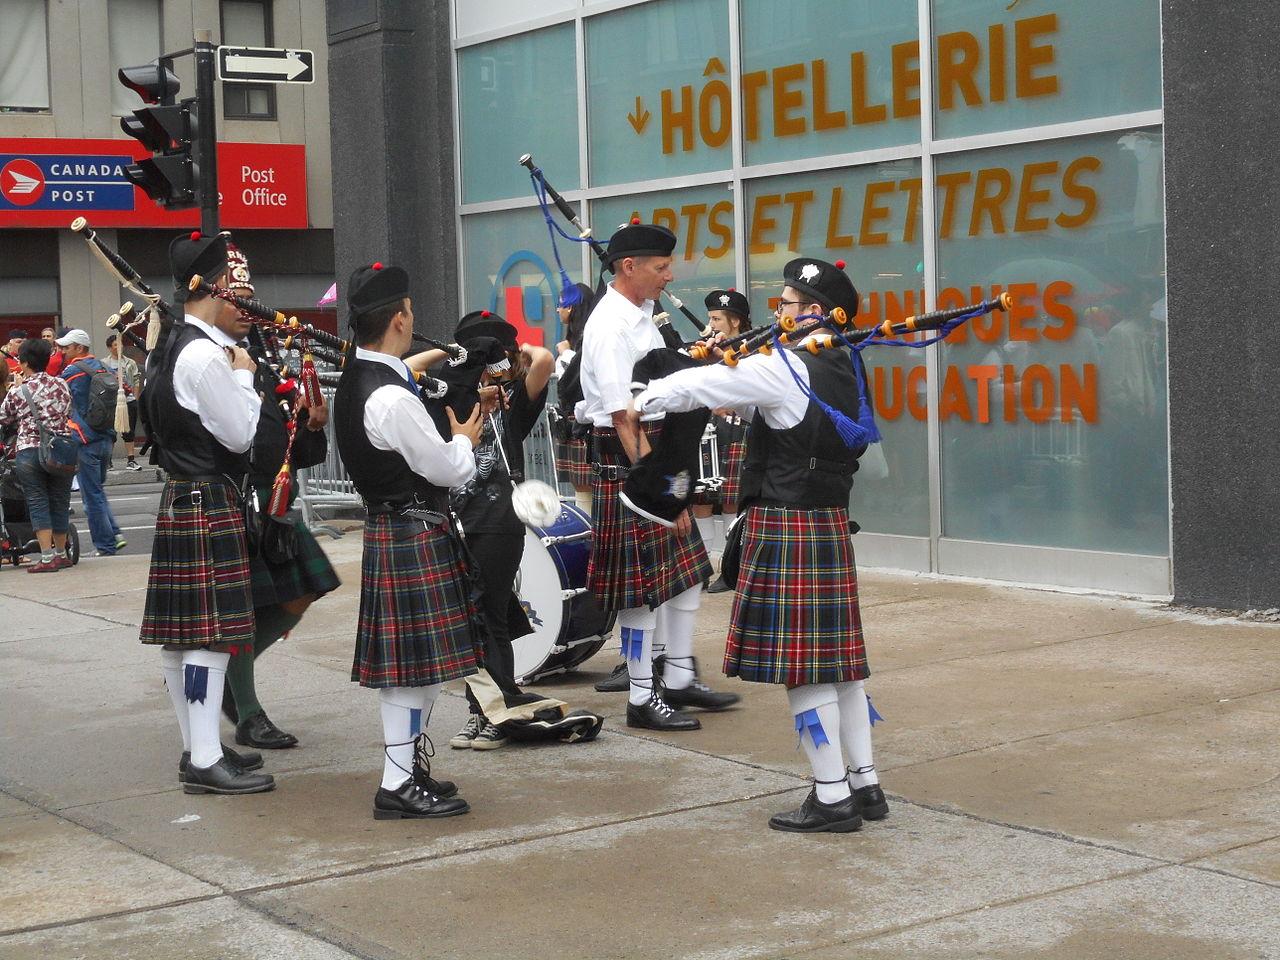 File:Canada Day 2015 on Saint Catherine Street - 020.jpg - Wikimedia